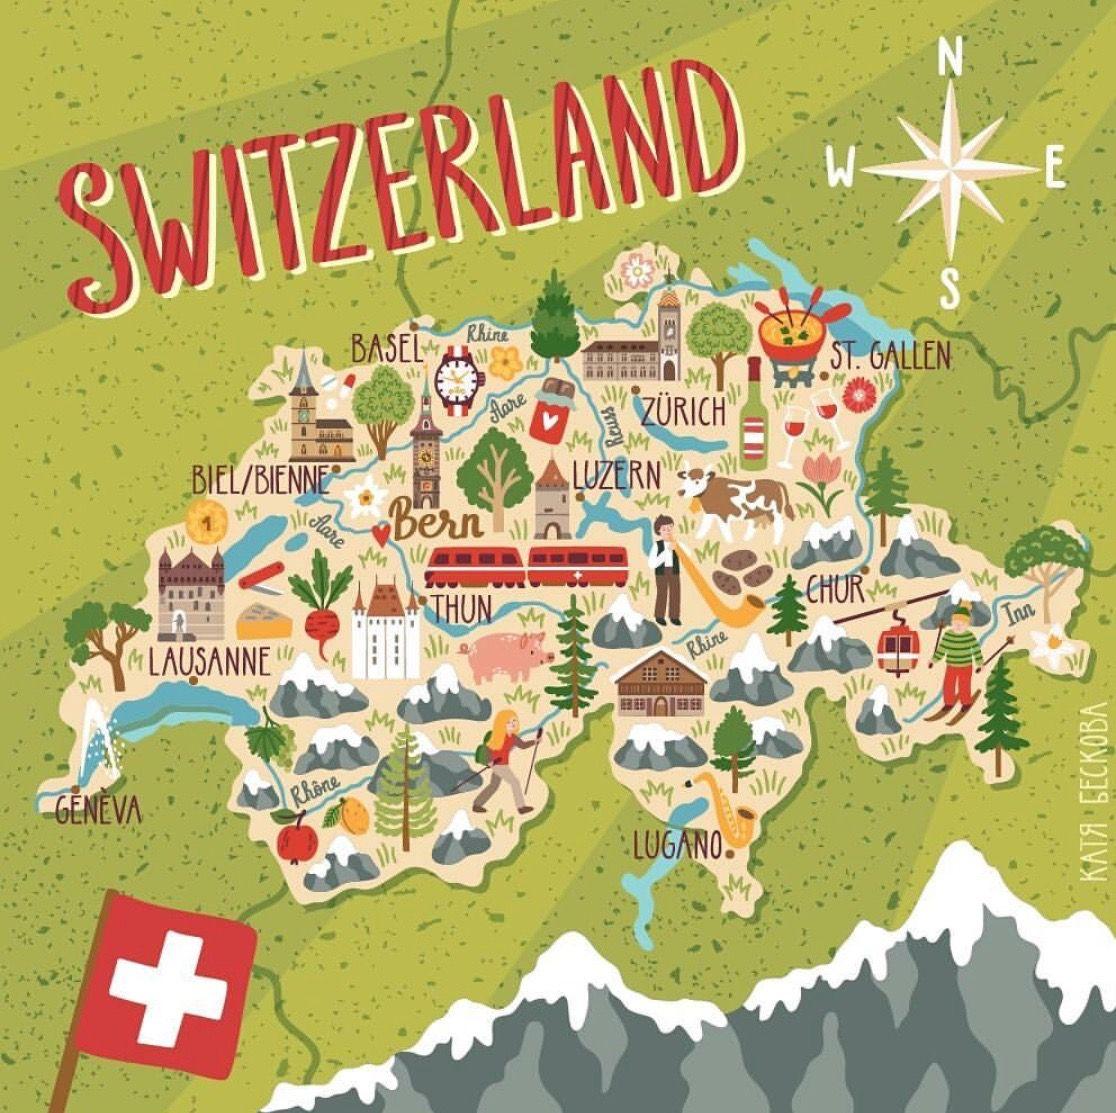 Schweiz Map Of Switzerland Travel Infographic Europe Map